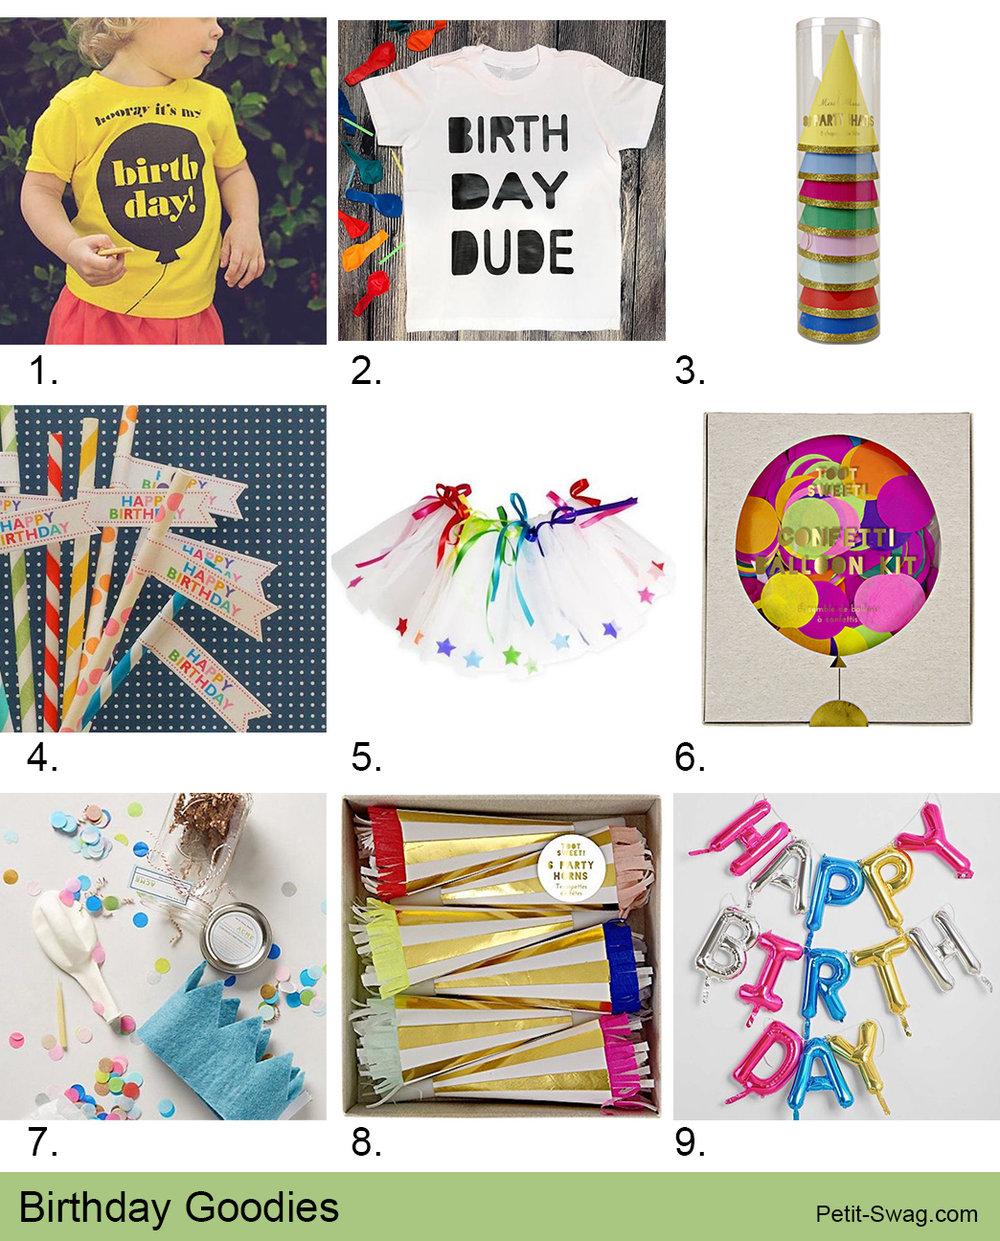 Birthday Goodies | Petit-Swag.com